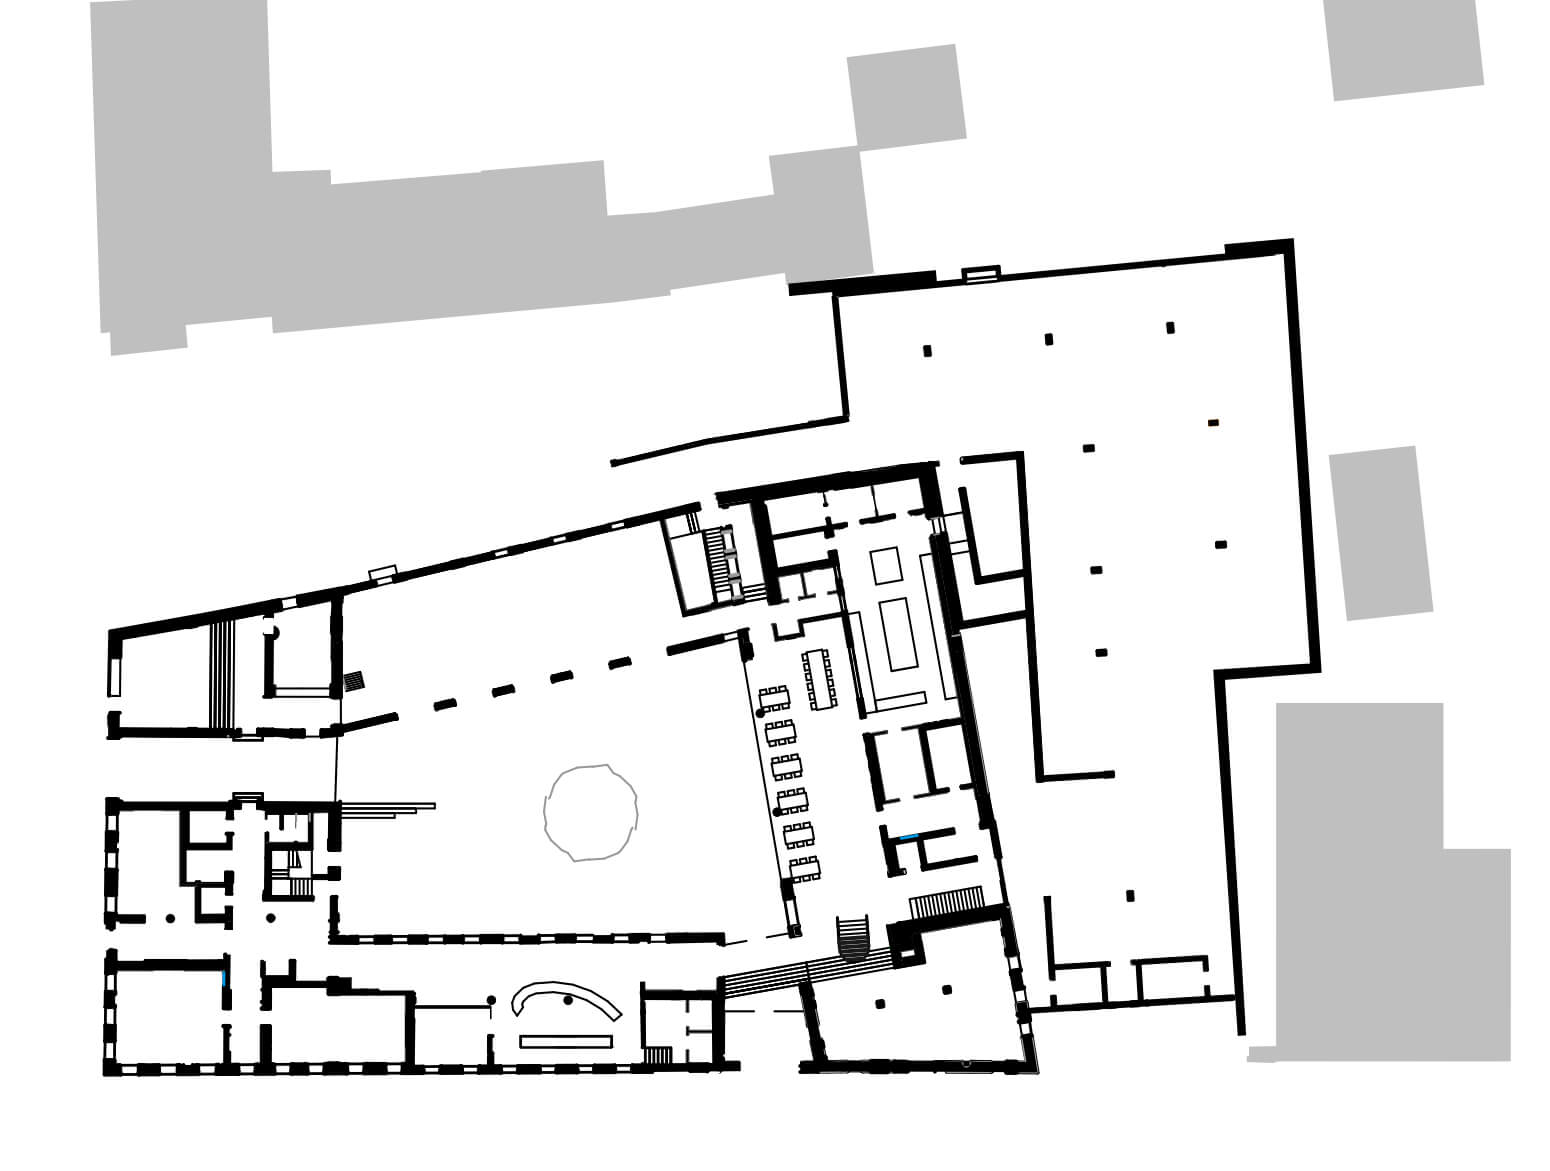 alte-posthalterei-ott-architekten-grundriss-eg